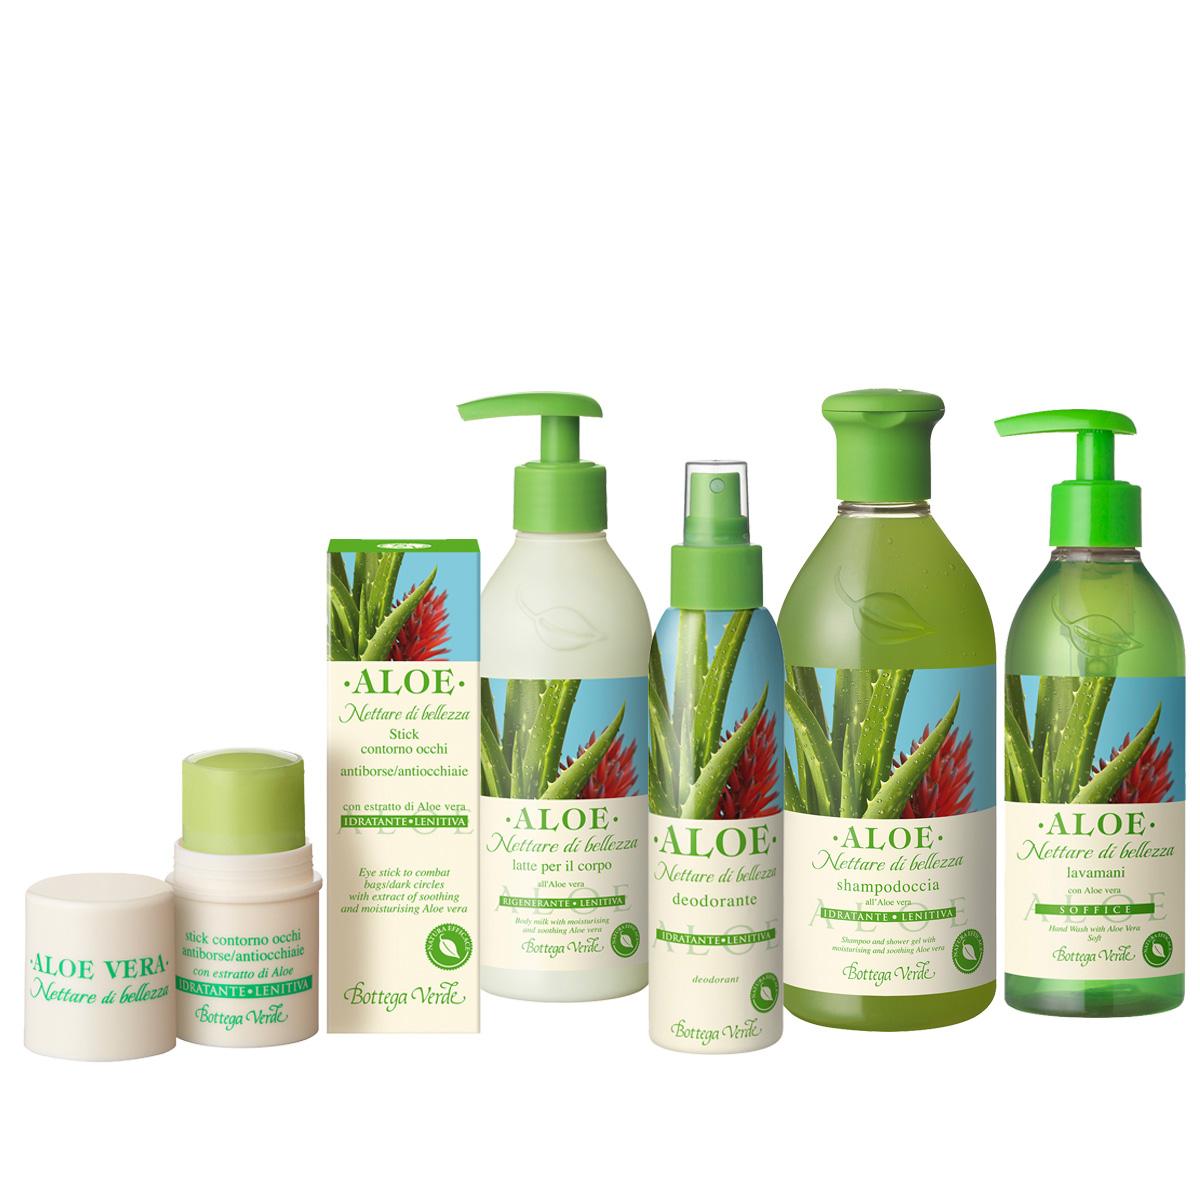 Set Aloe Vera Mix - Aloe, 125 ML + 250 ML + 5 ML + 250 ML + 400 ML